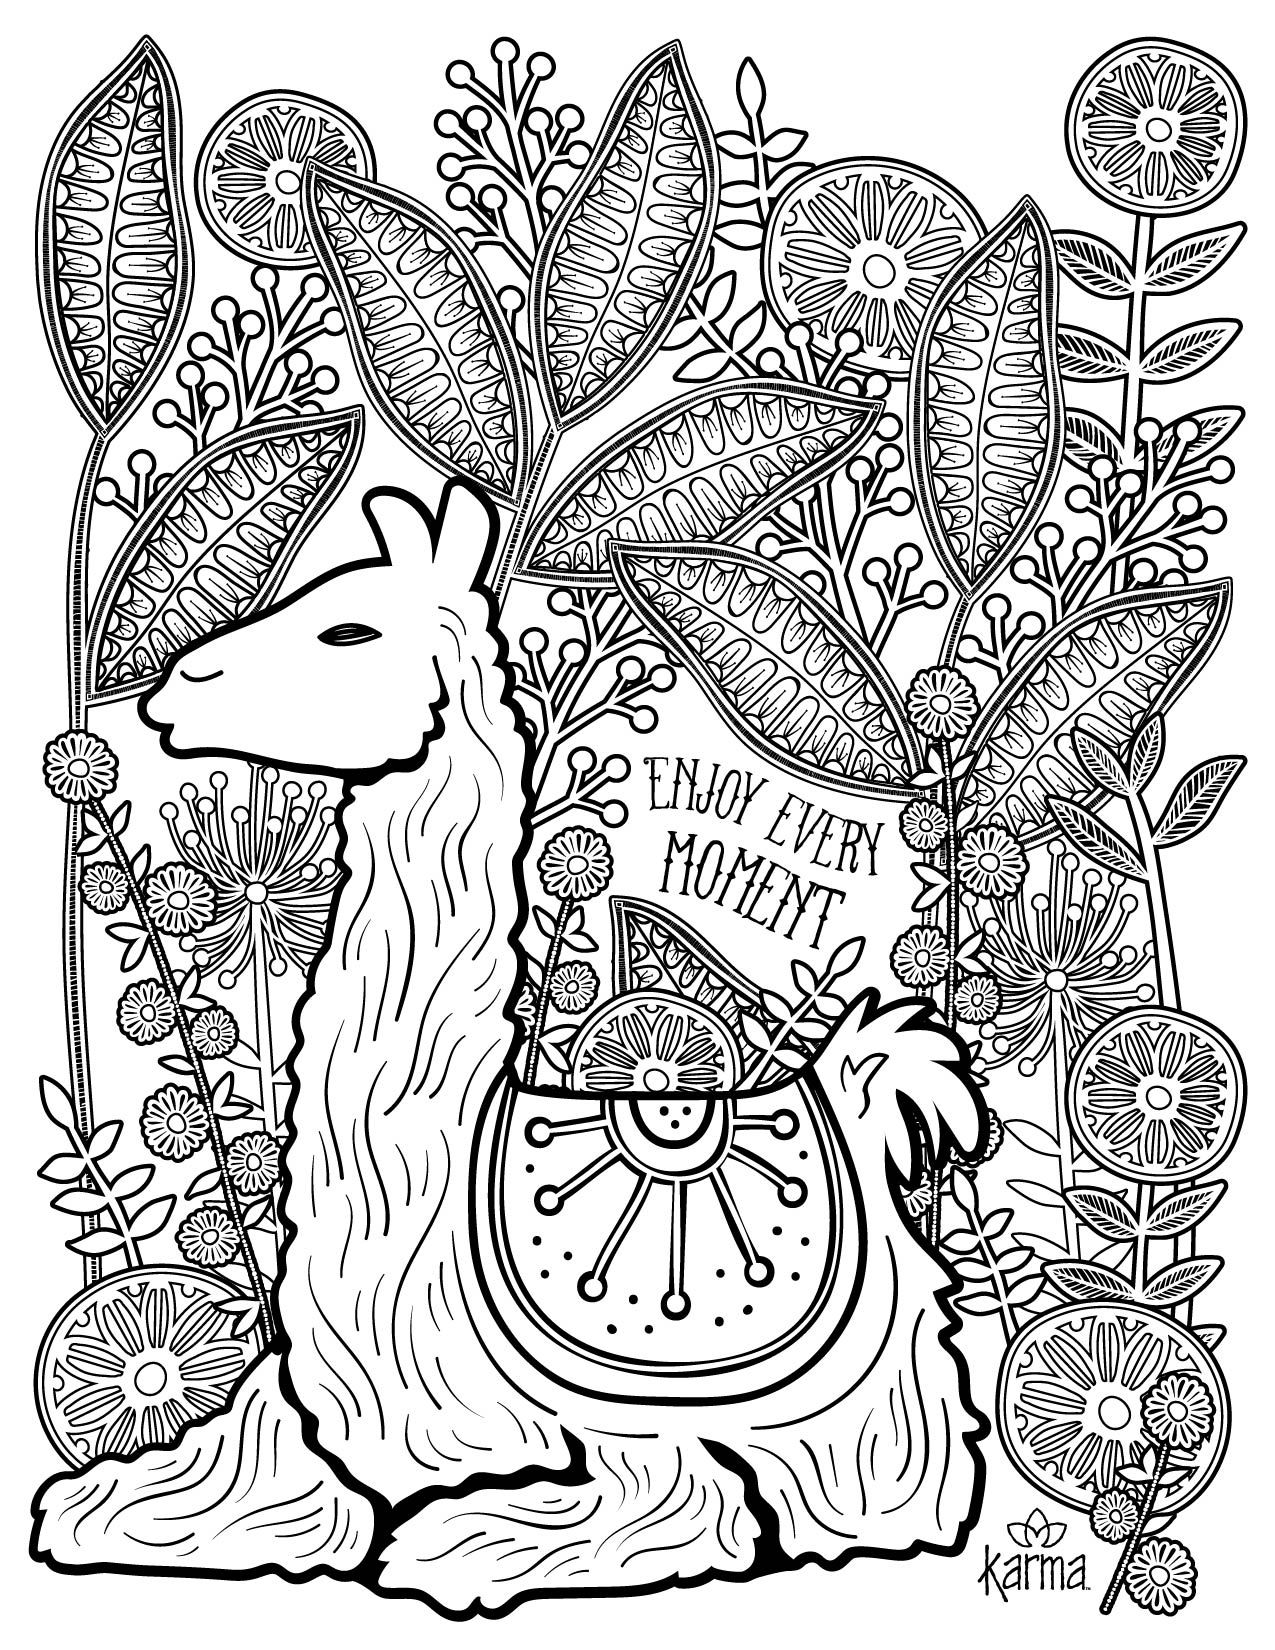 llama! free and printable coloring page by karma gifts